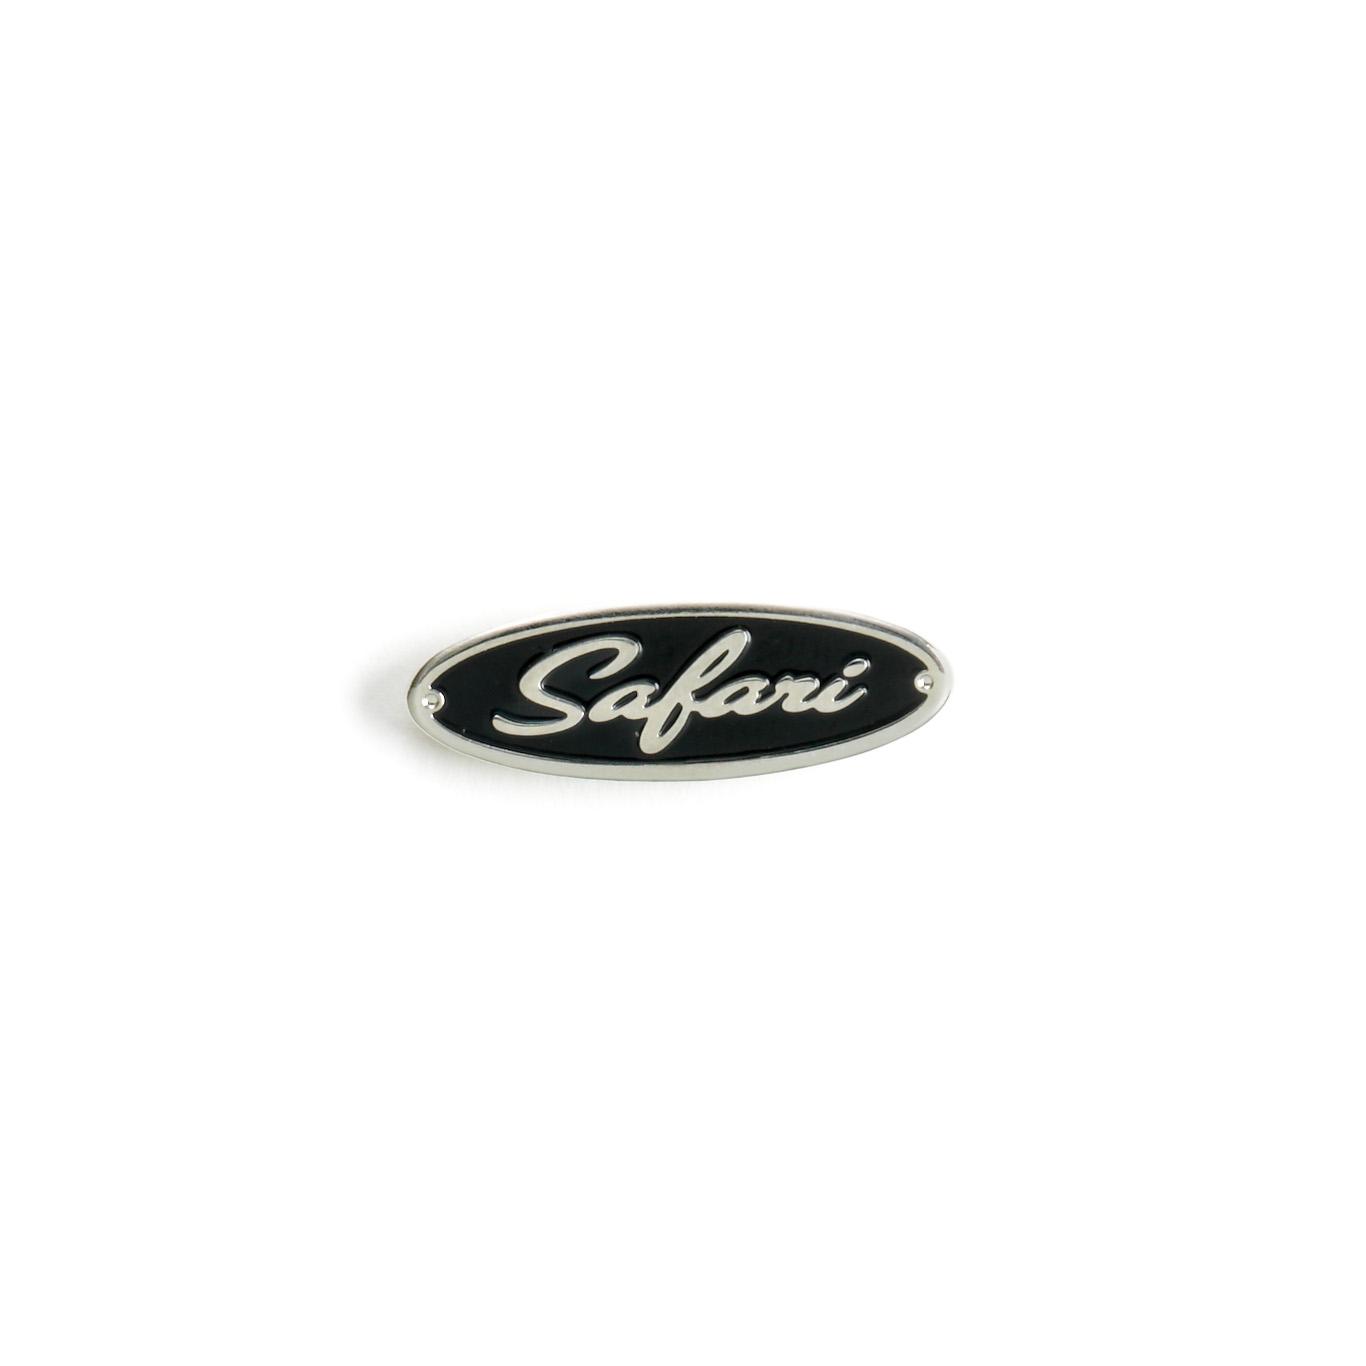 AIRMKT eCom PN 26368W-01 Trailer Badge Pins 3 Qtr Inch-Safari 42461 WEB